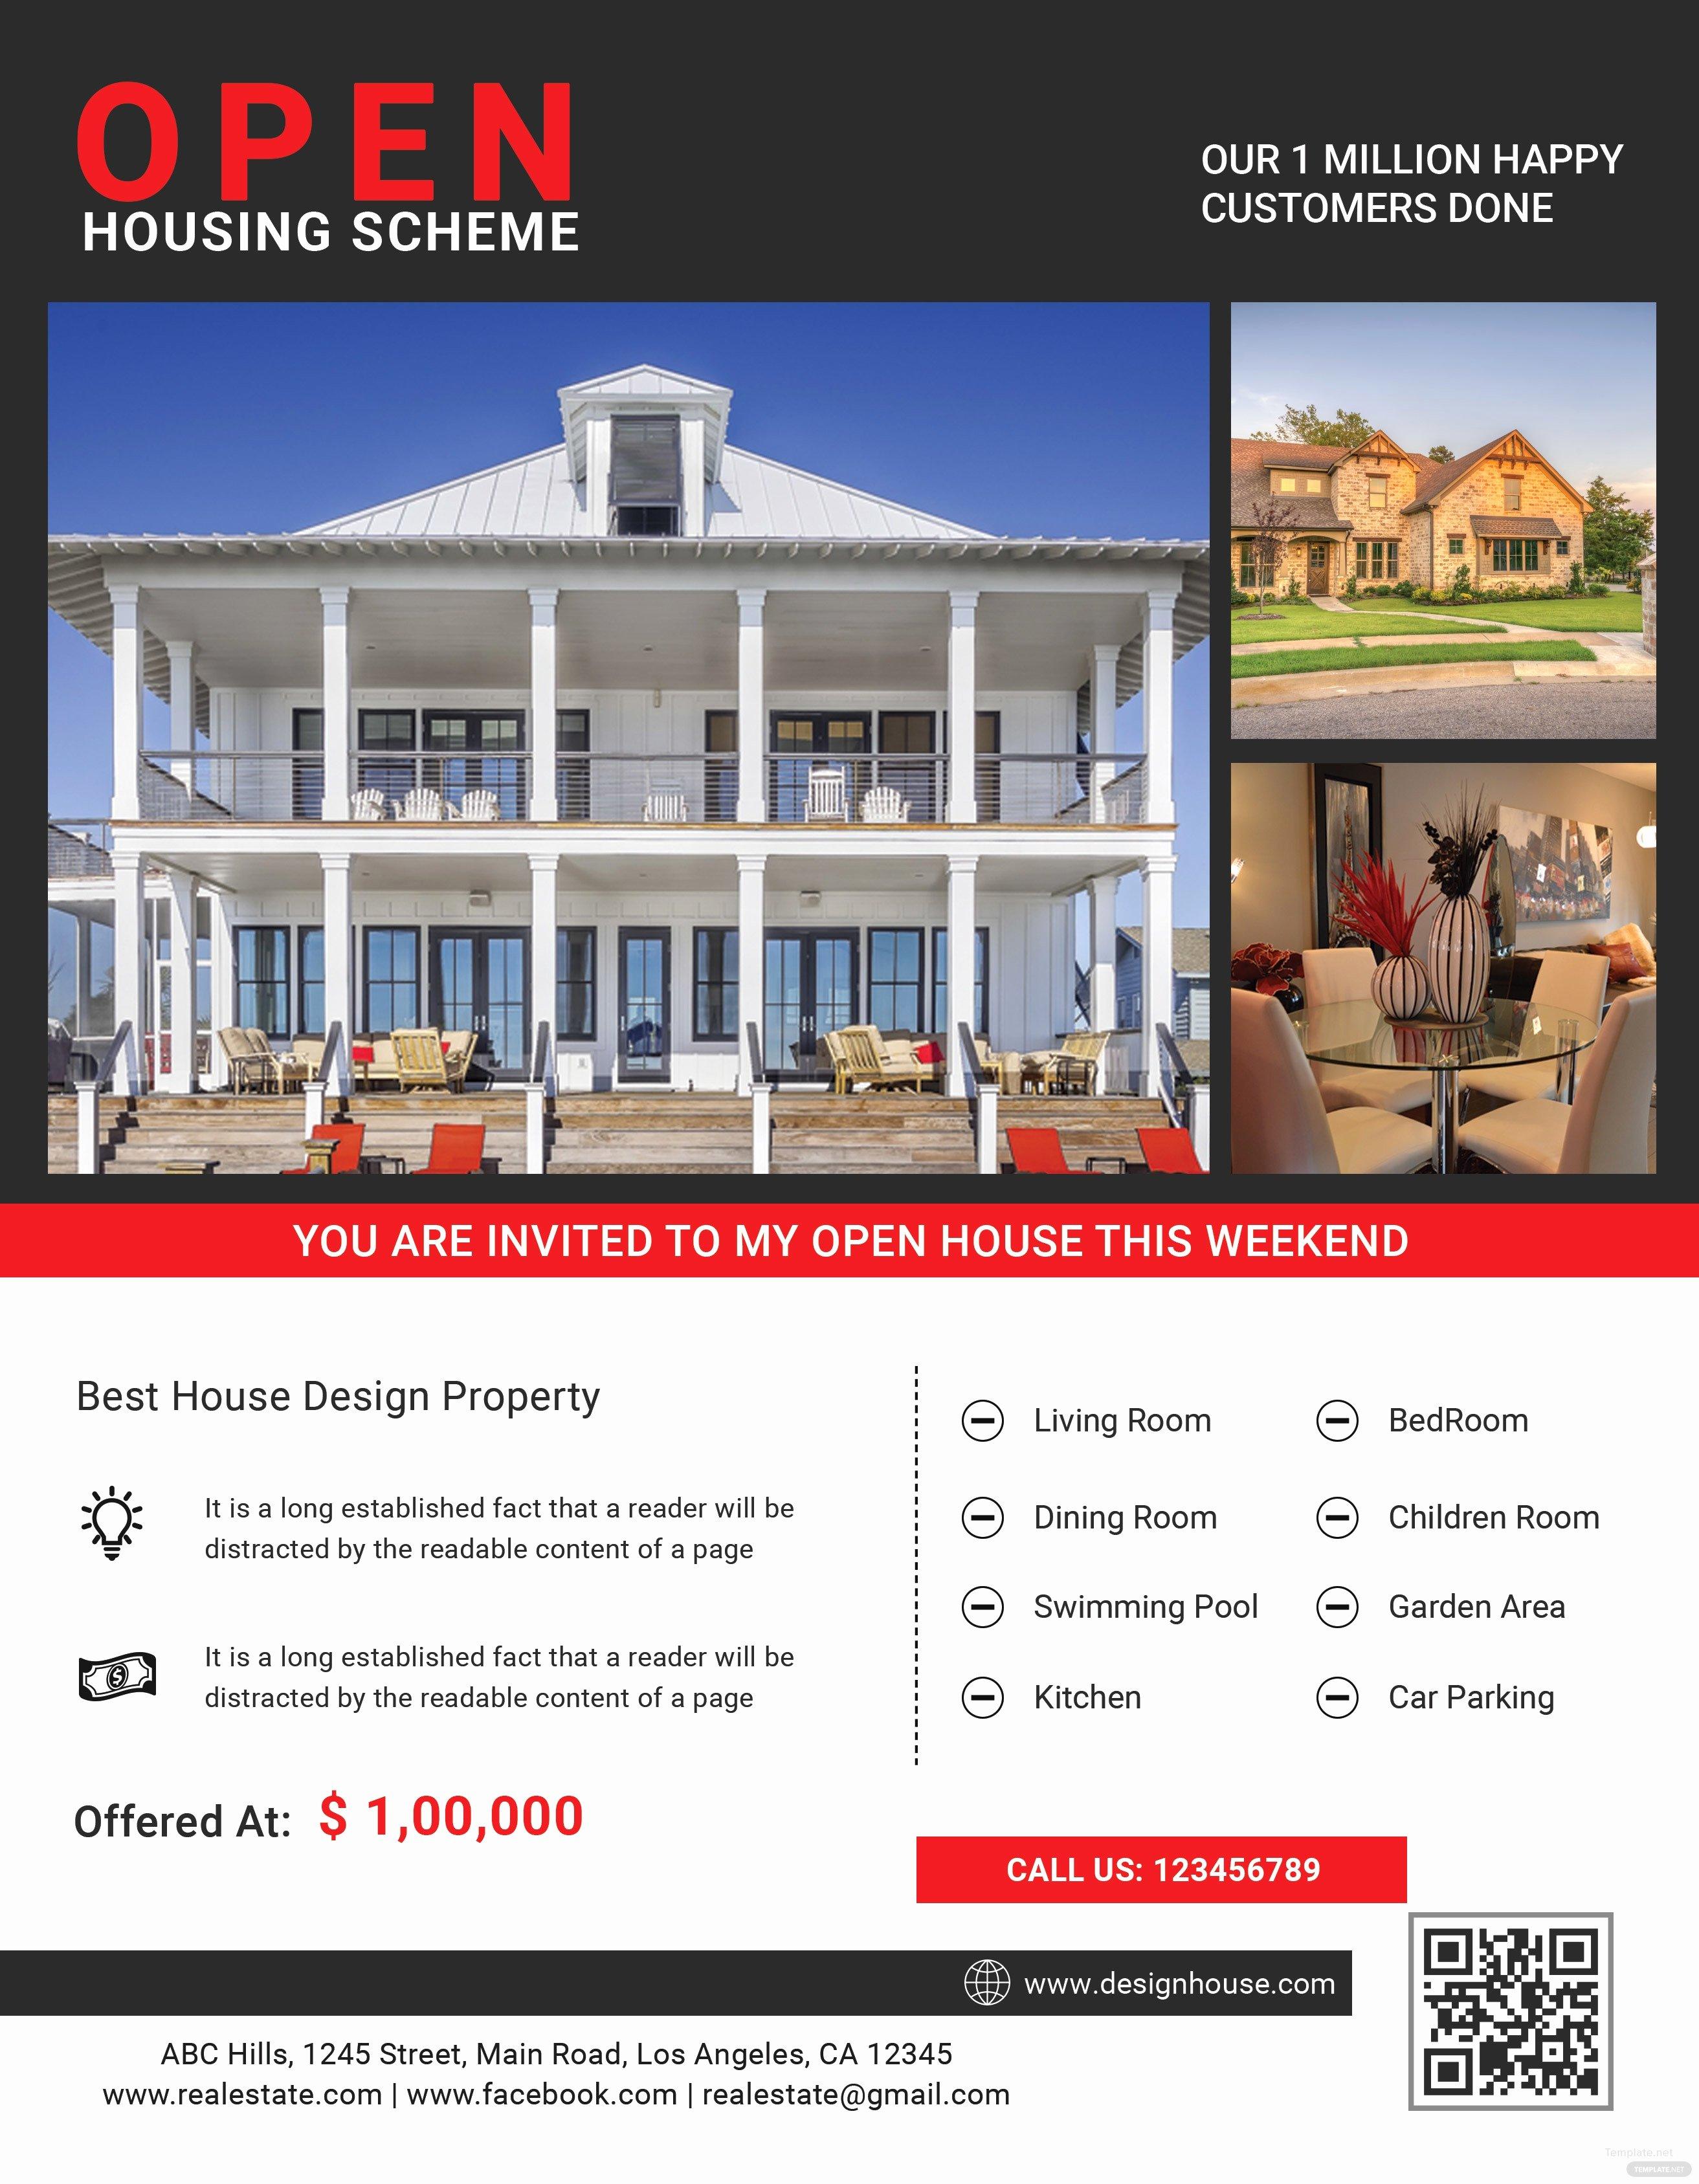 Broker Open House Flyer Awesome Luxury Open House Flyer Template In Adobe Shop